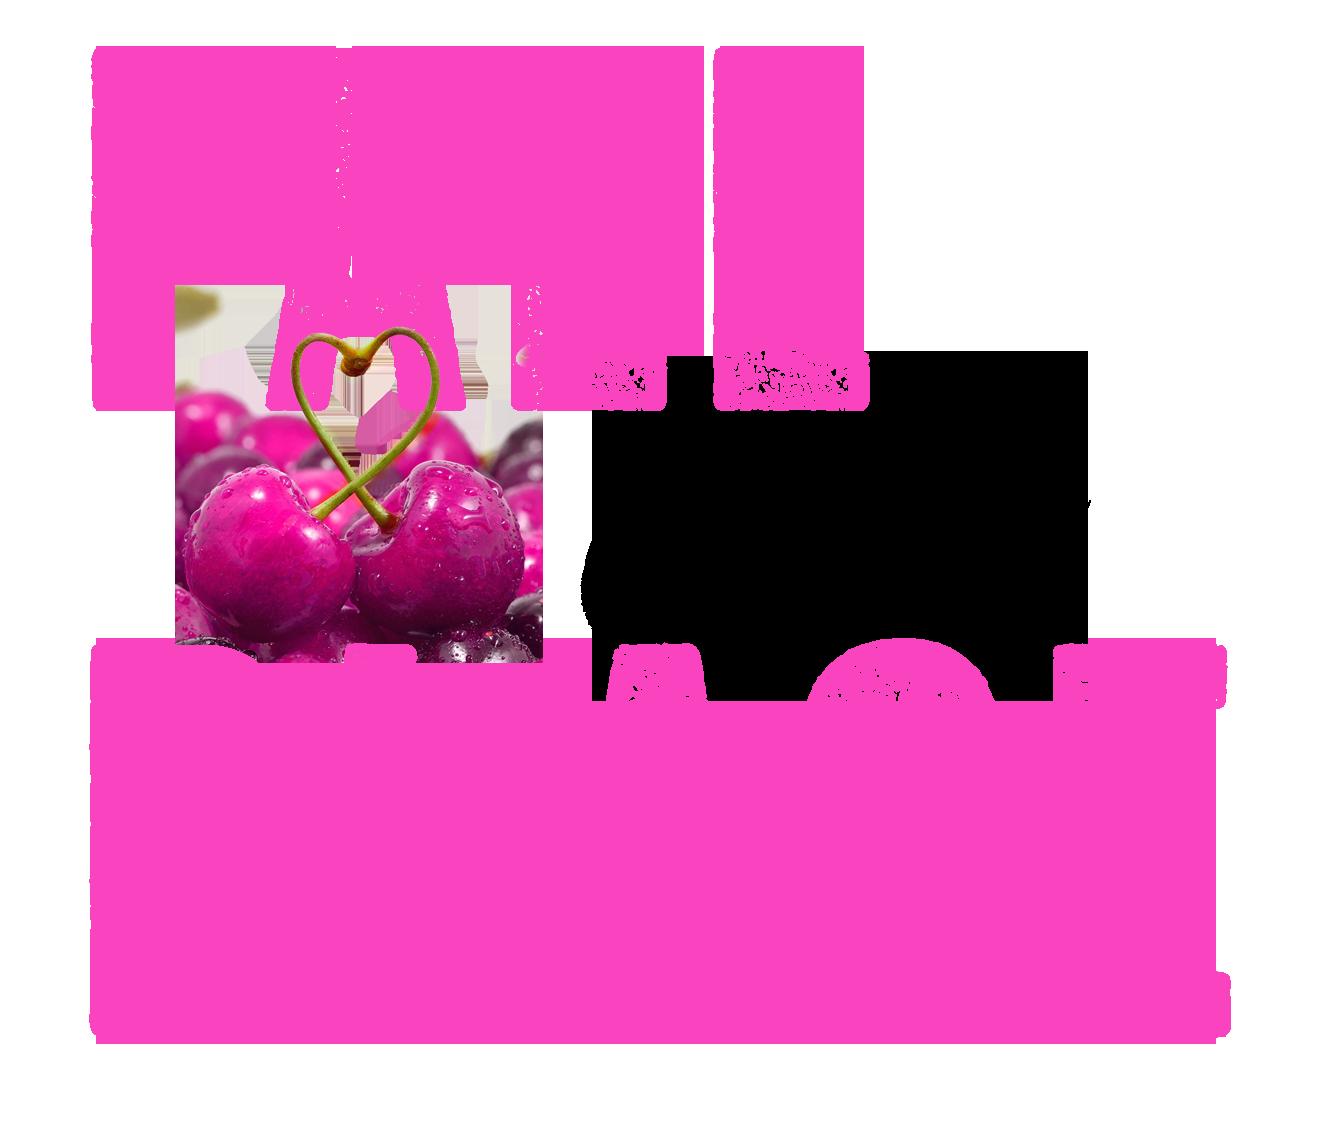 FallIntoPlace_Title